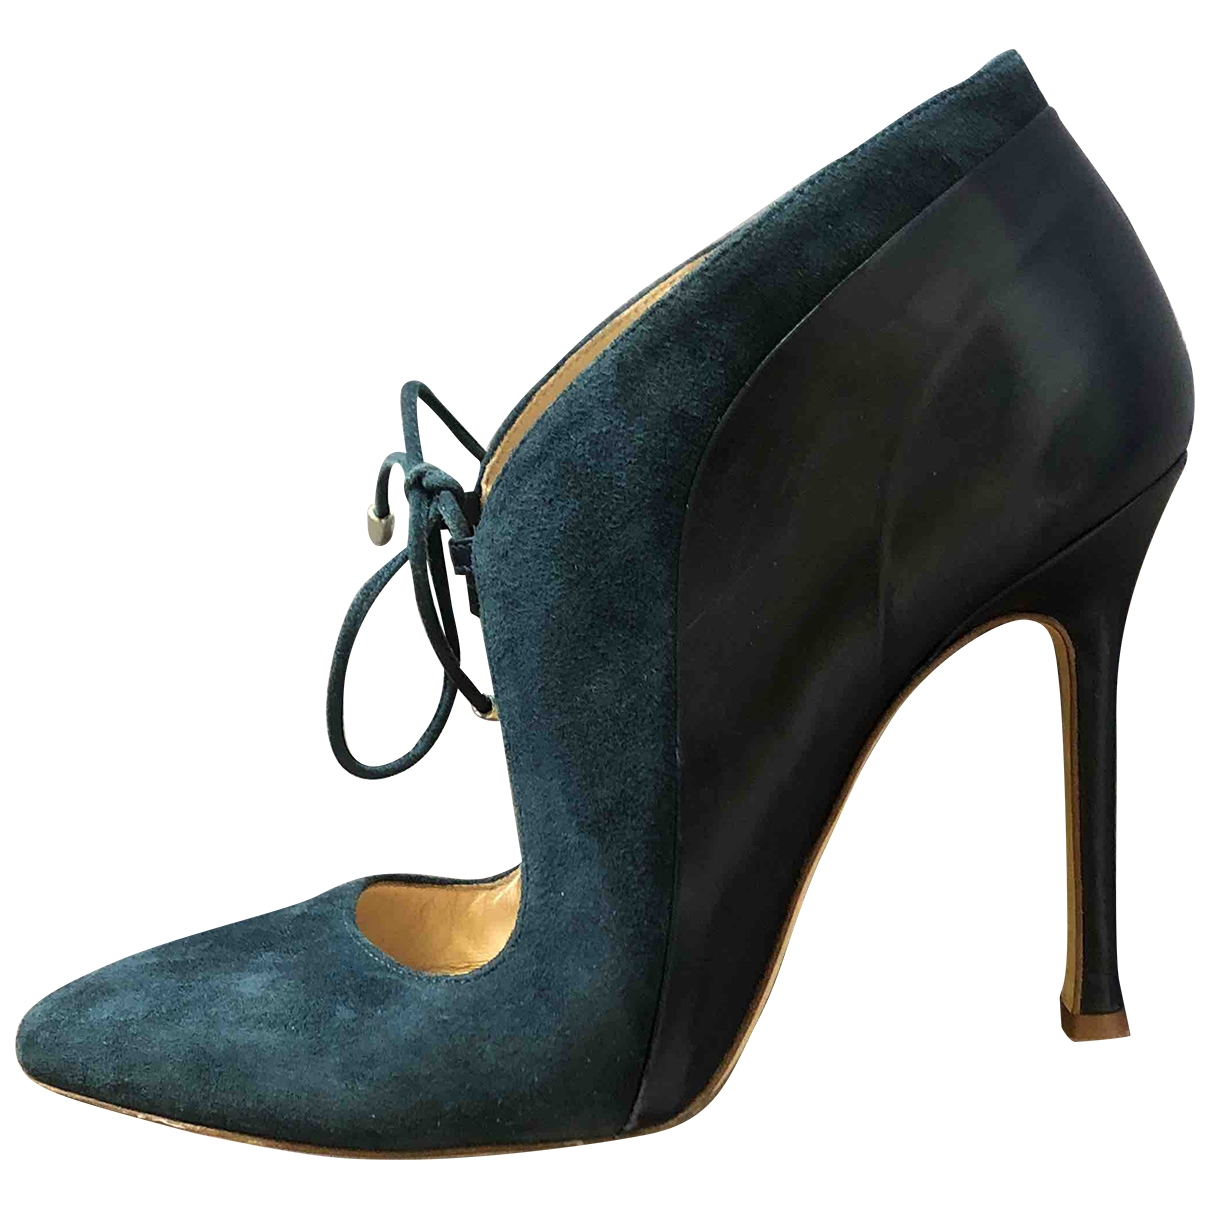 Chelsea Paris \N Blue Leather Heels for Women 38 EU